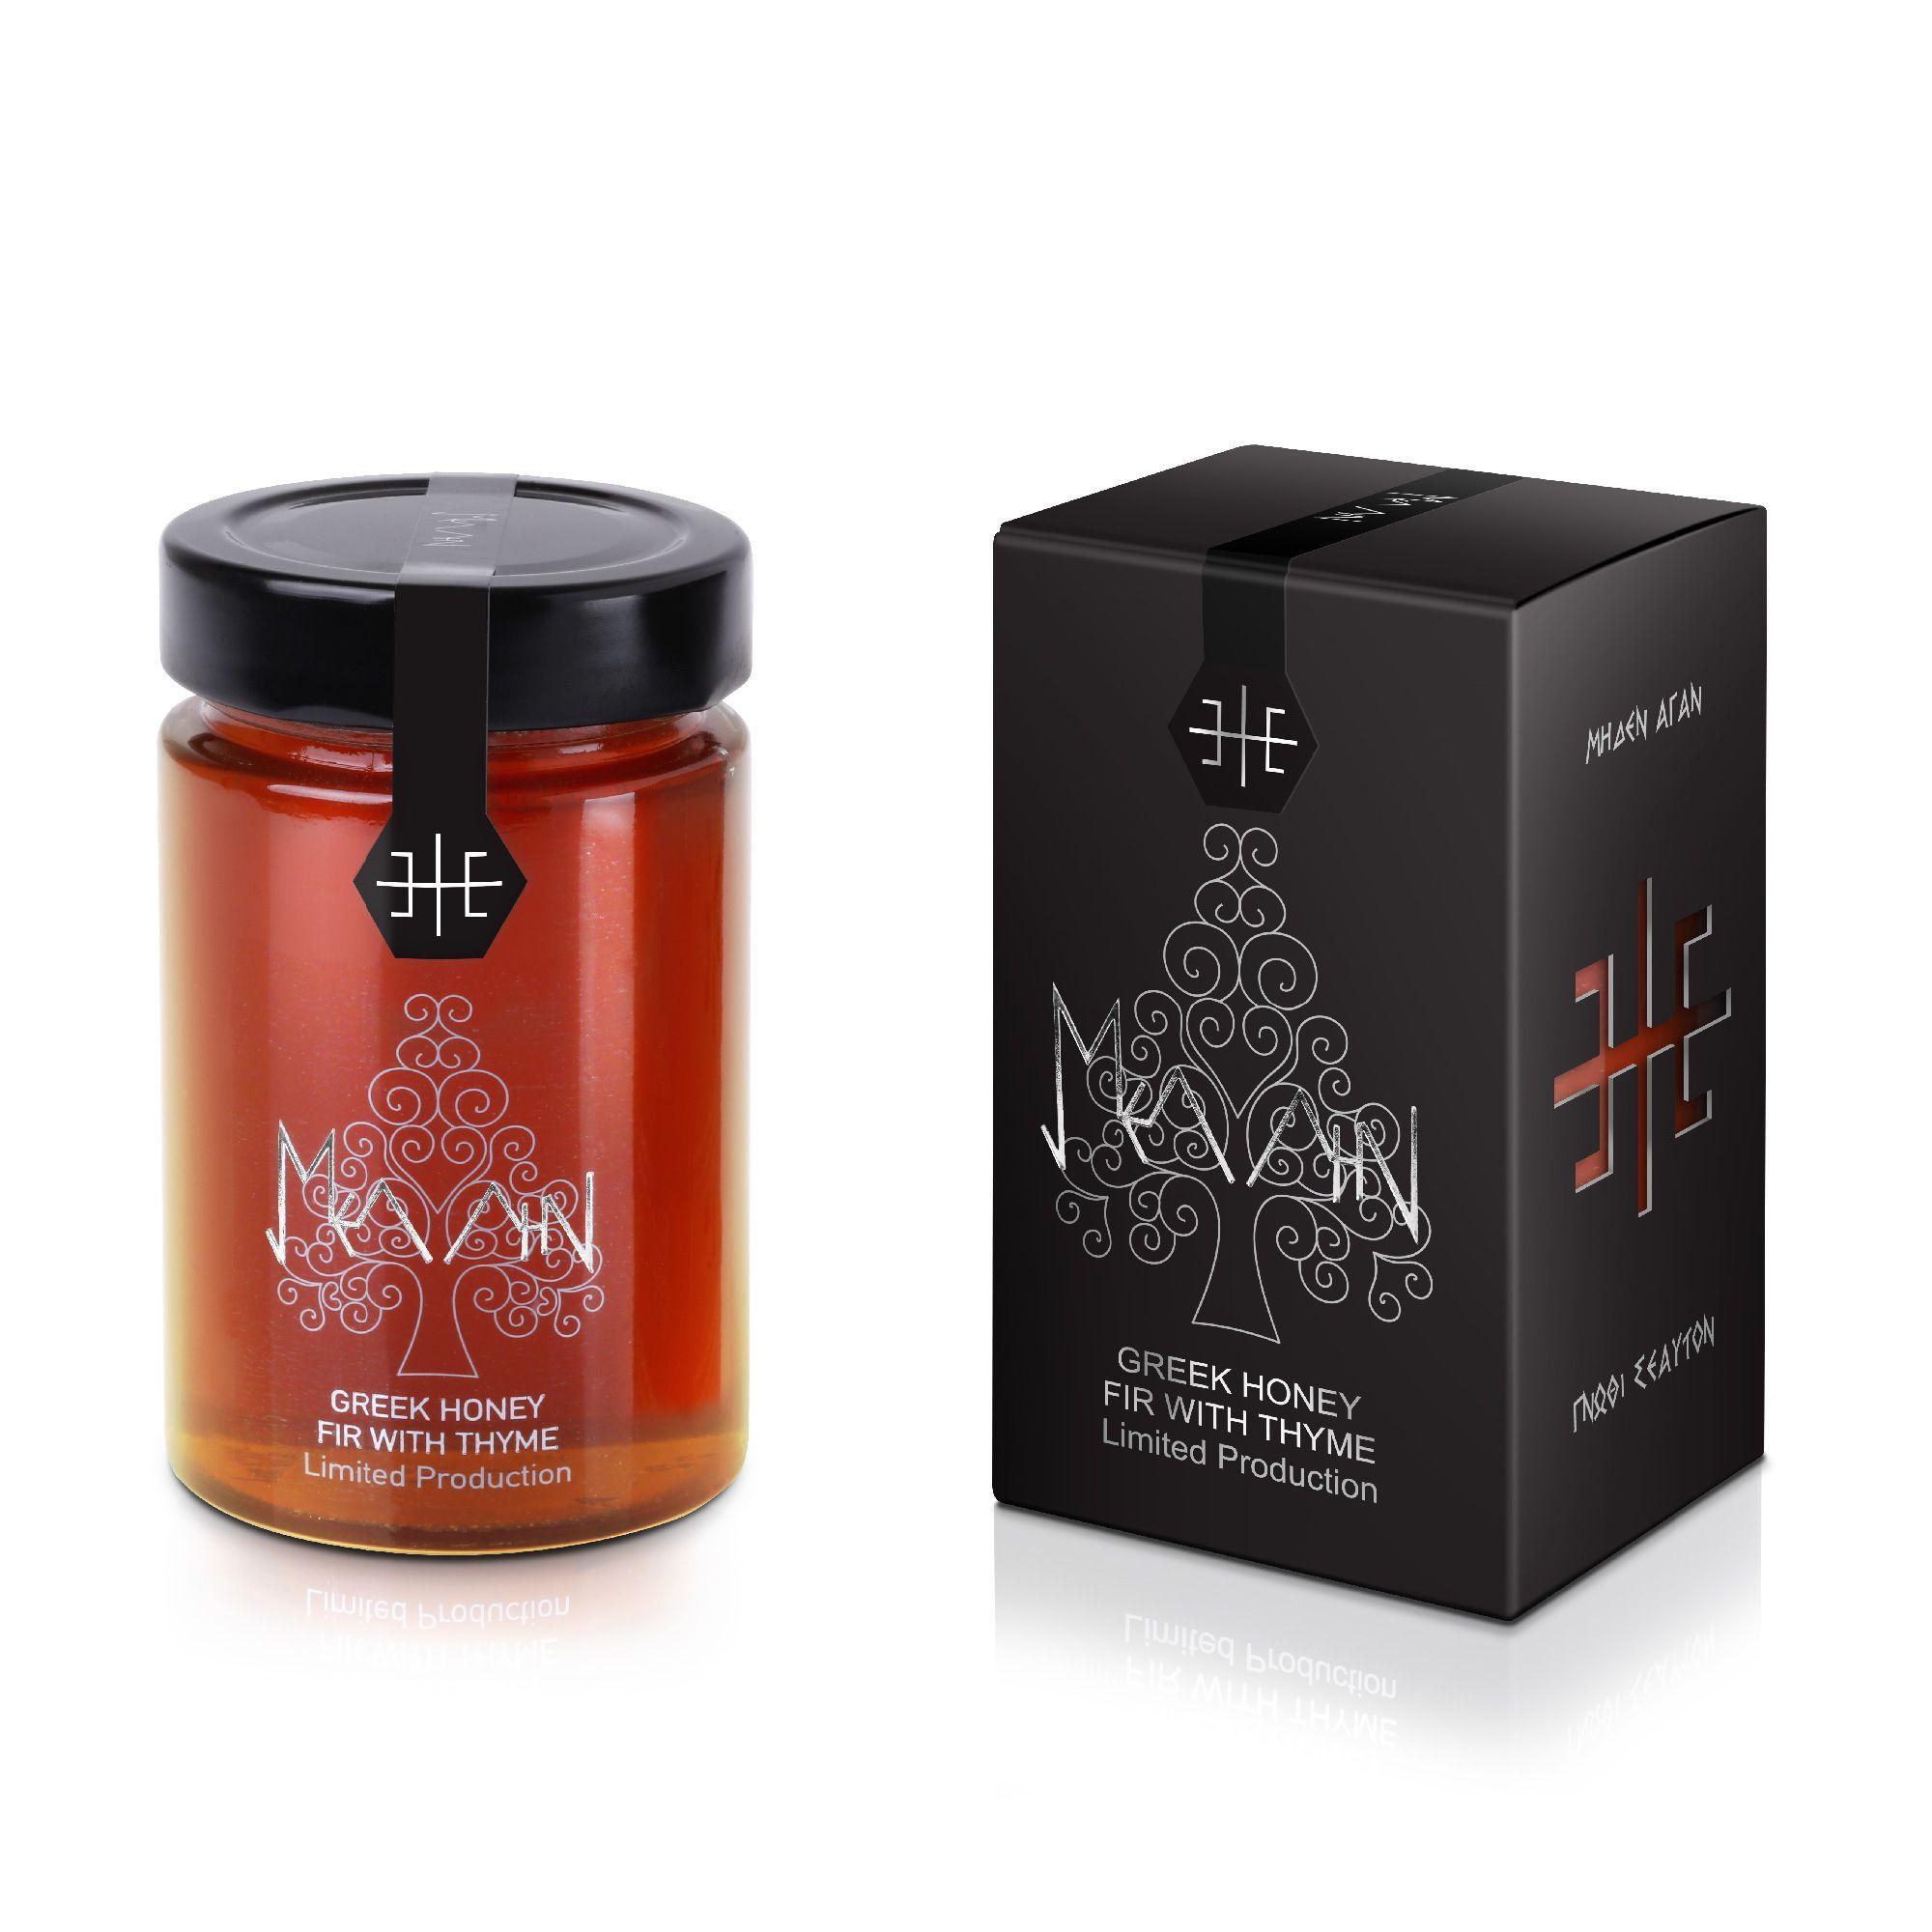 Mellin Premium Greek Honey Fir With Thyme Honey Packaging Honey Jar Labels Honey Design